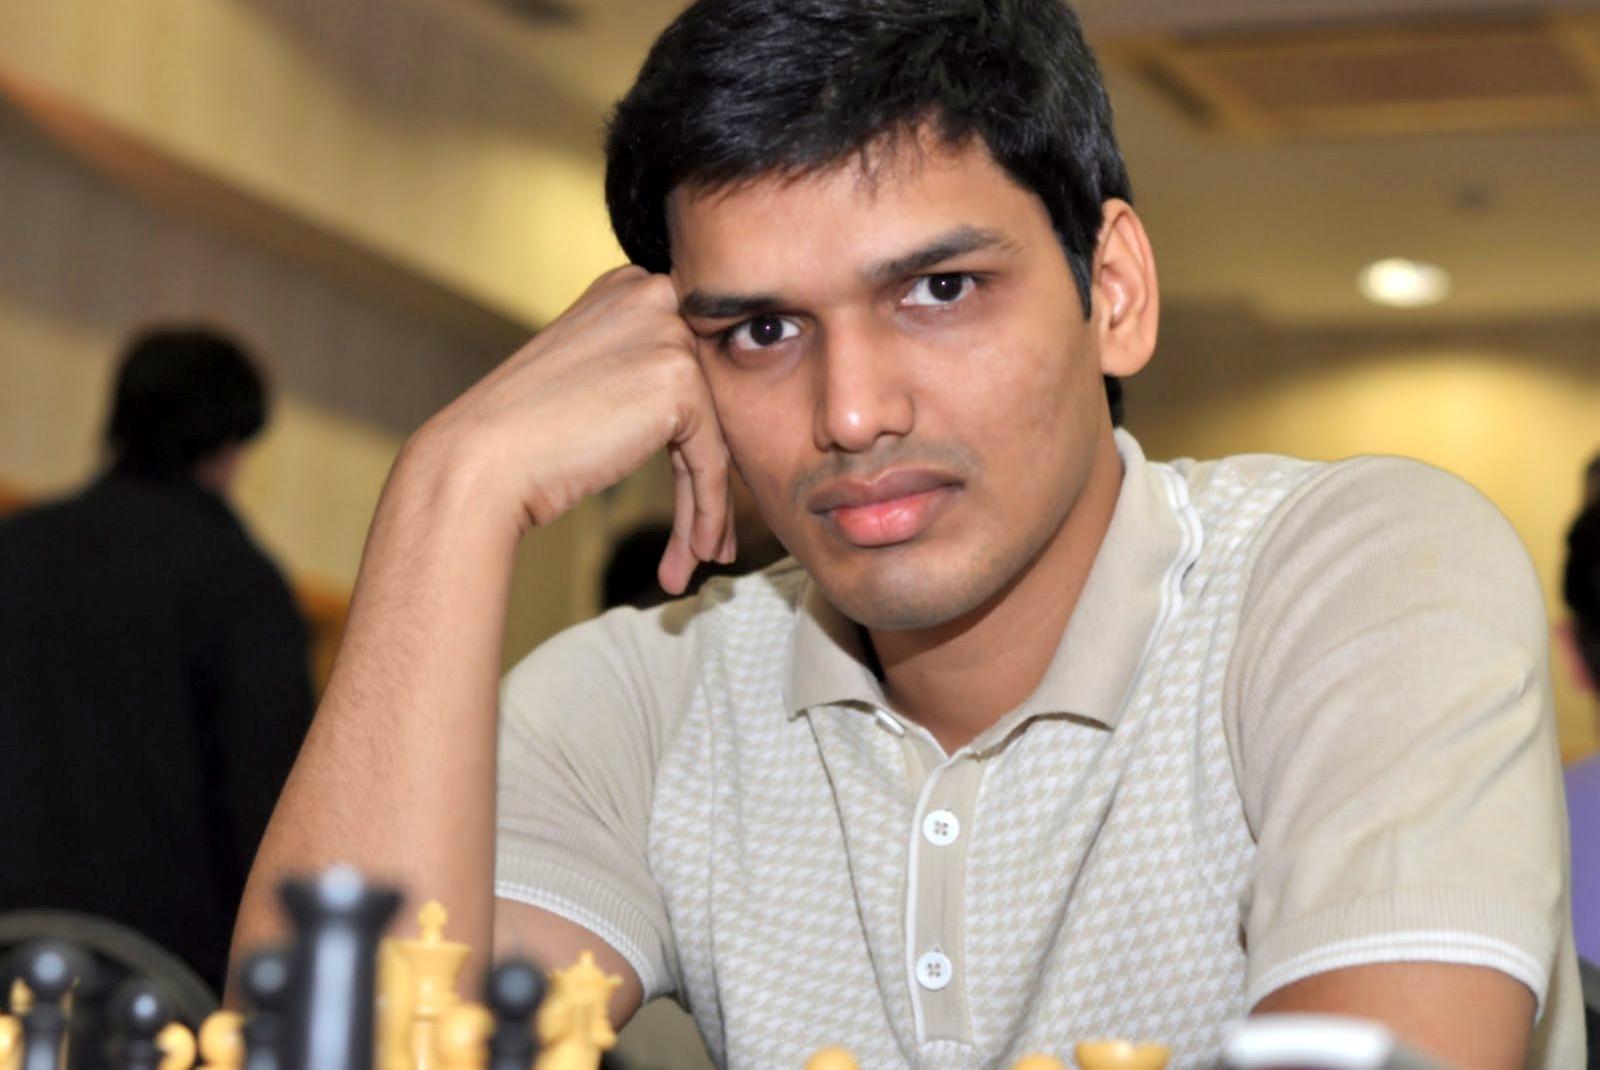 FIDE Grand Prix: P Harikrishna dishes out stellar performance to beat world No.4 Levon Aronian